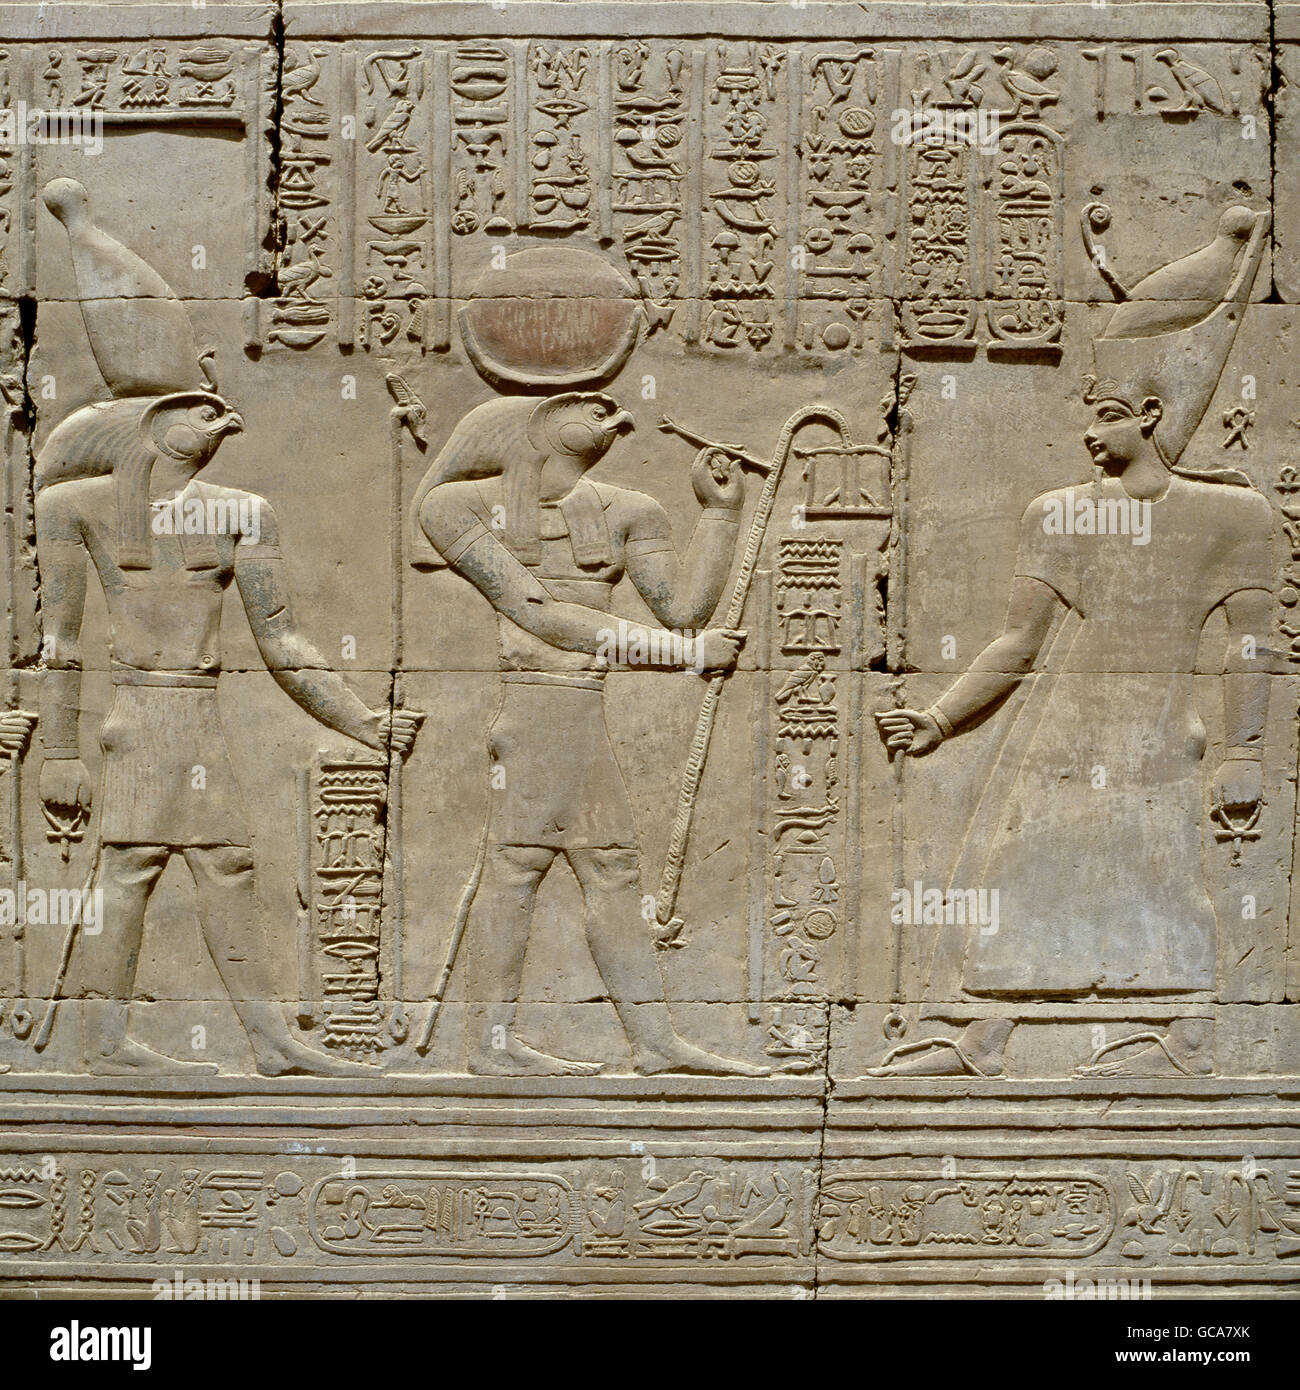 Bildende Kunst, antike, Ägypten, Relief im Tempel von Kom Ombo Stockbild